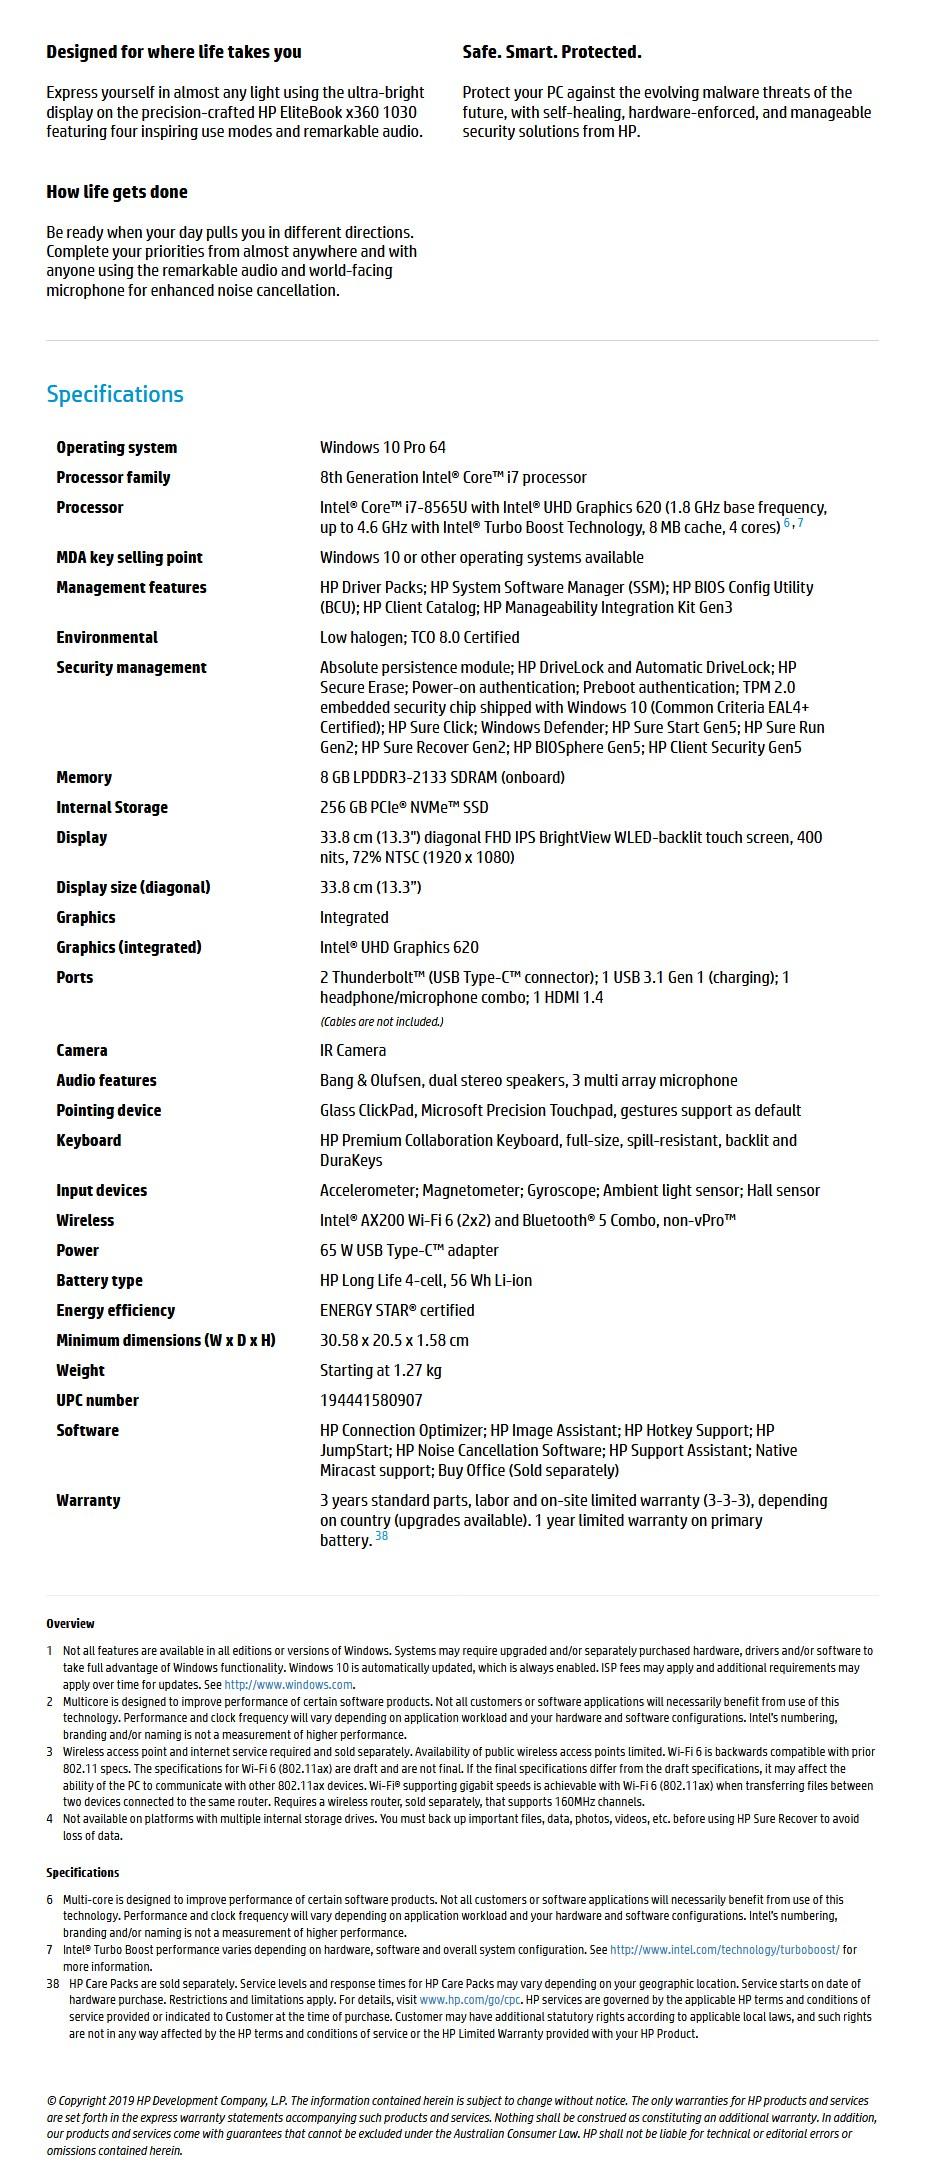 "HP EliteBook x360 1030 G4 13.3"" Laptop i7-8565U 8GB 256GB W10P - Touch - Overview 1"